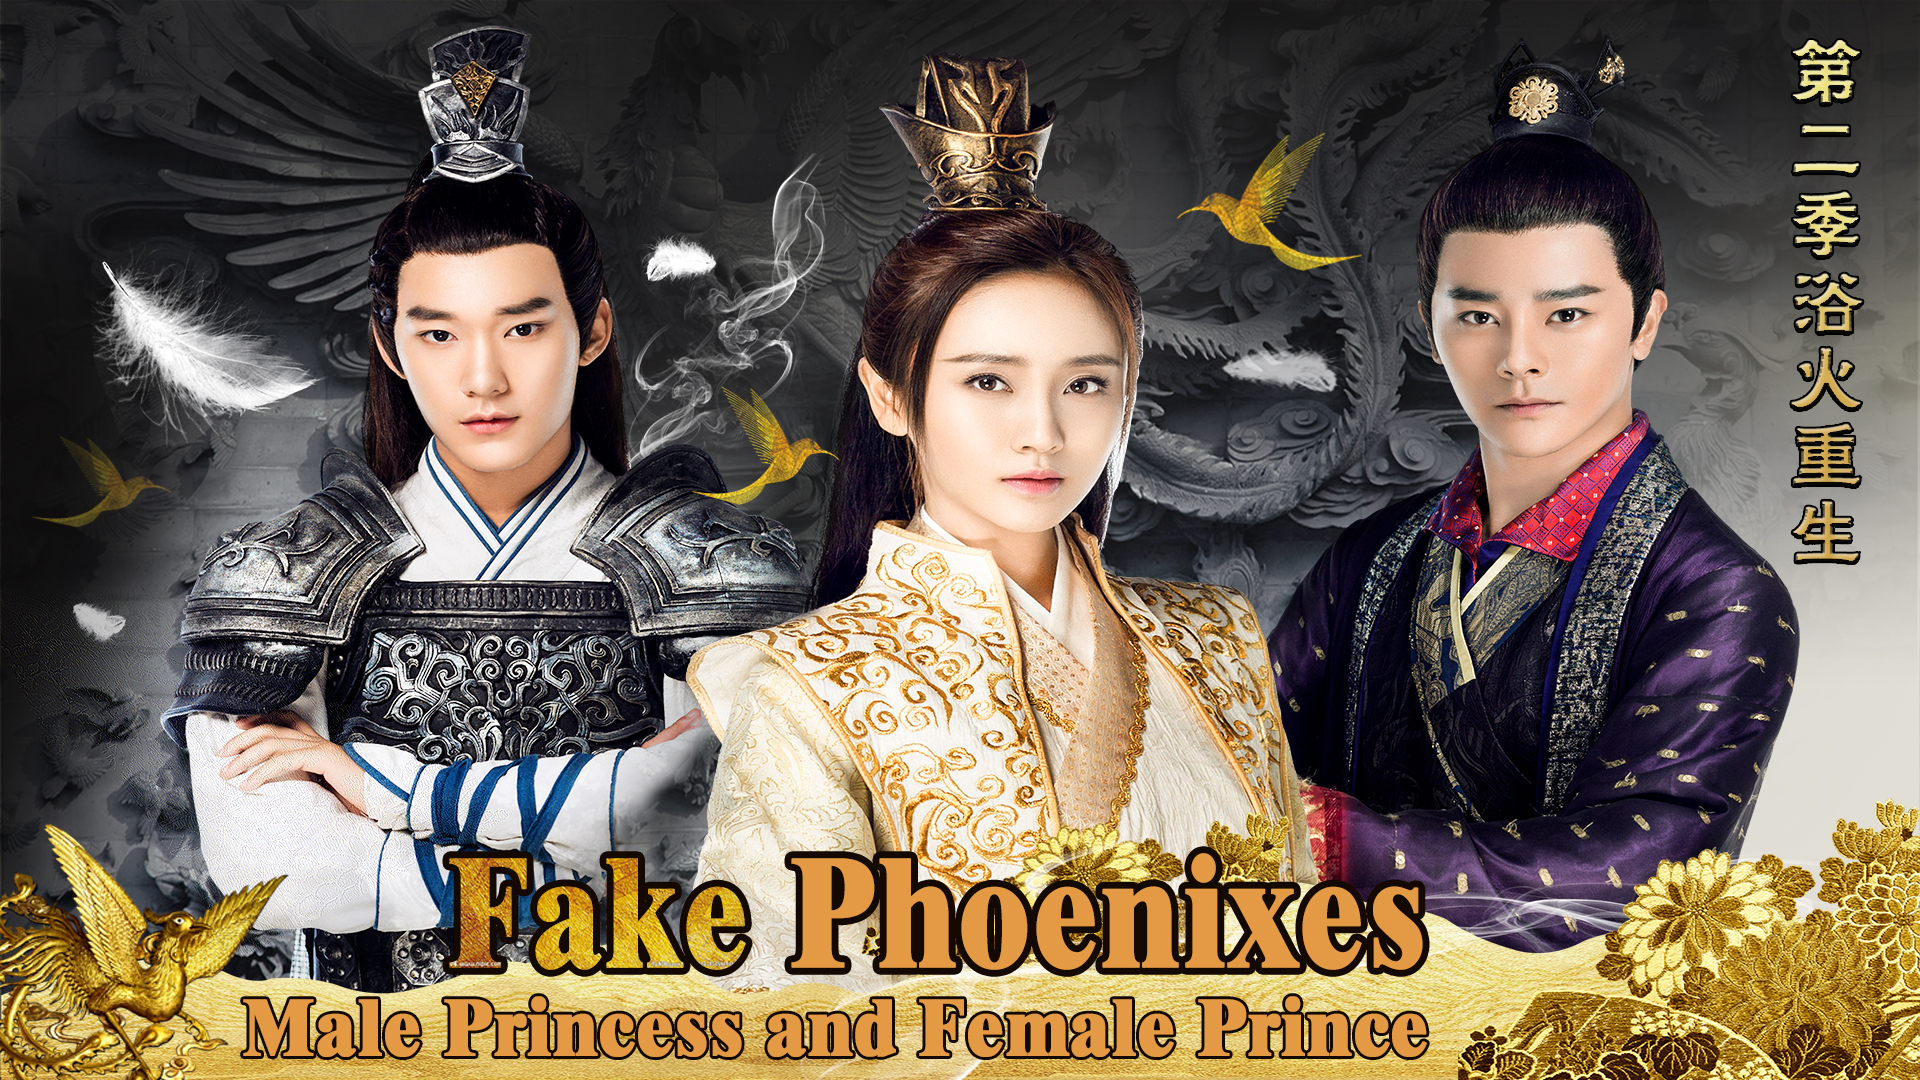 Fake Phoenixes, Male Princess and Female Prince on Amazon Prime Video UK